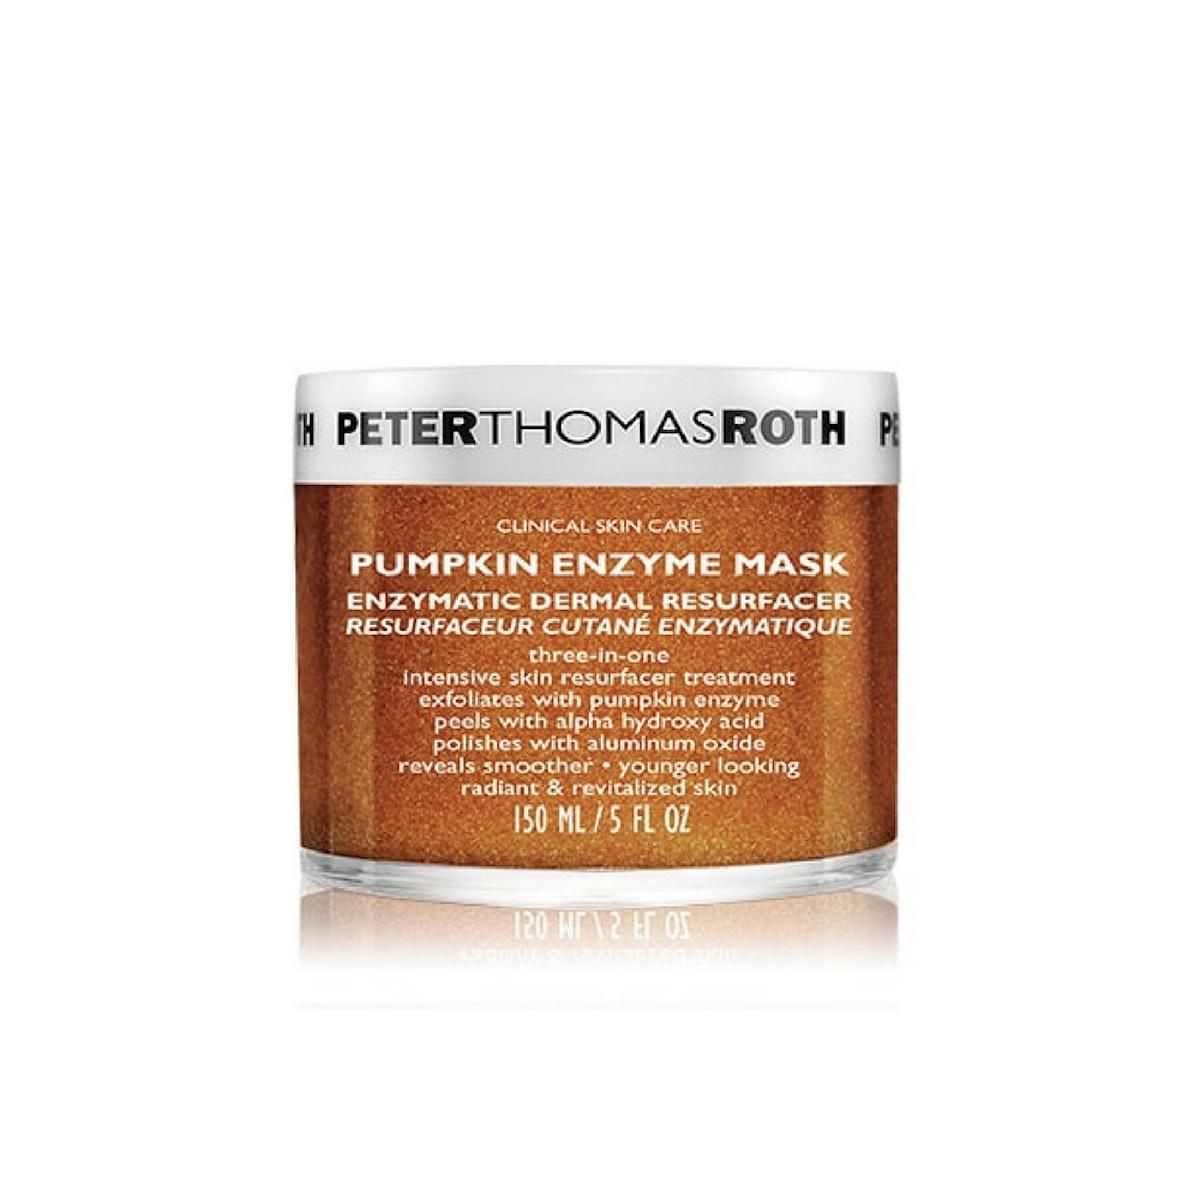 Pumpkin Enzyme Mask Enzymatic Dermal Resurfacer